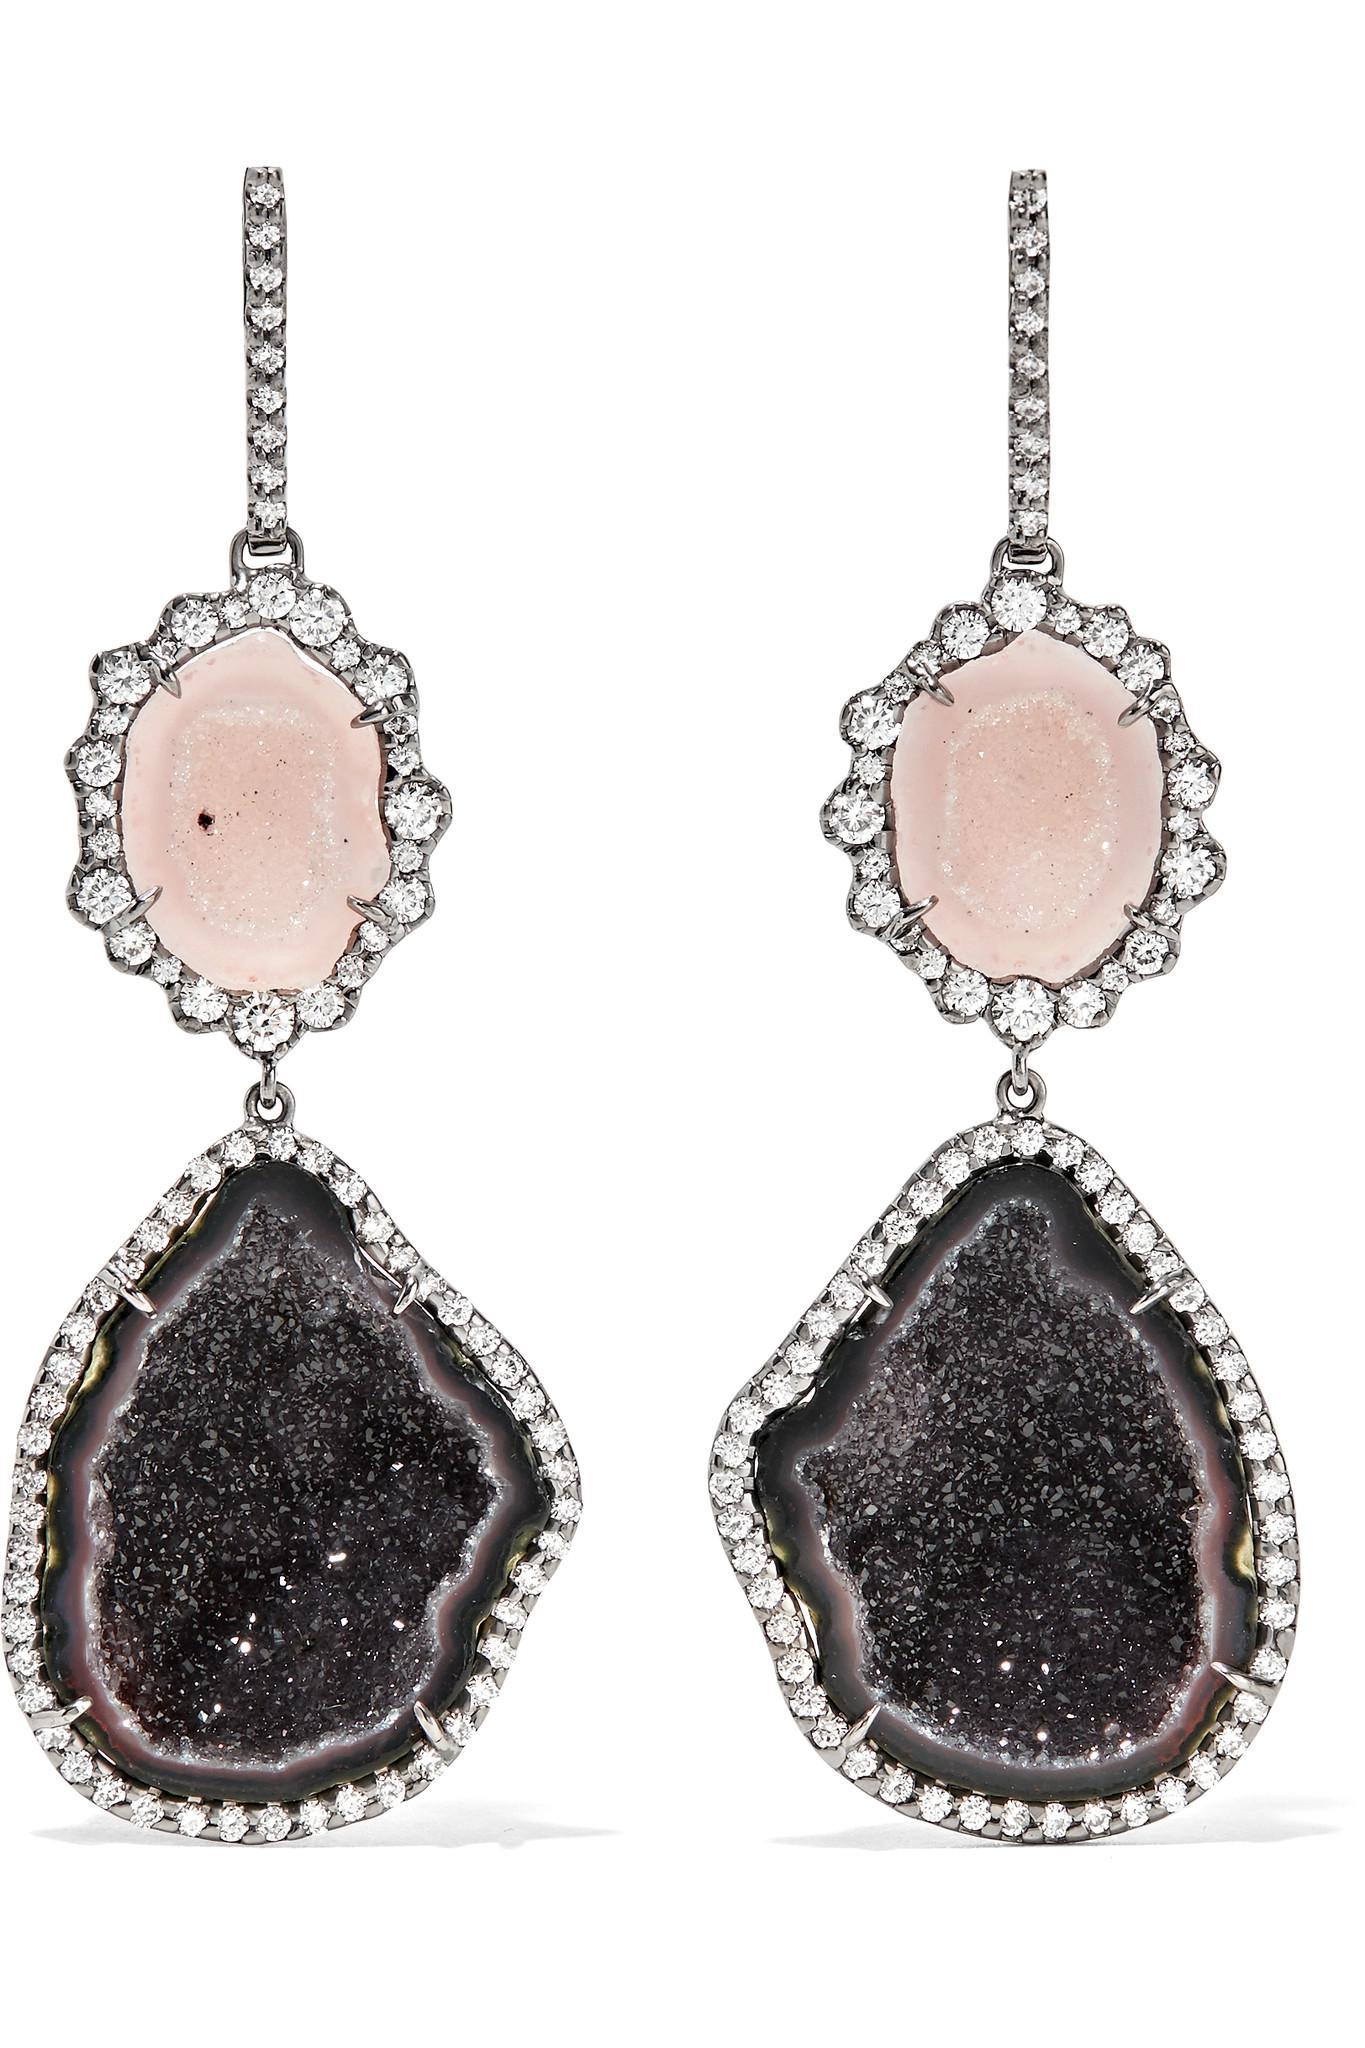 18-karat Blackened White Gold, Diamond And Geode Earrings - one size Kimberly McDonald